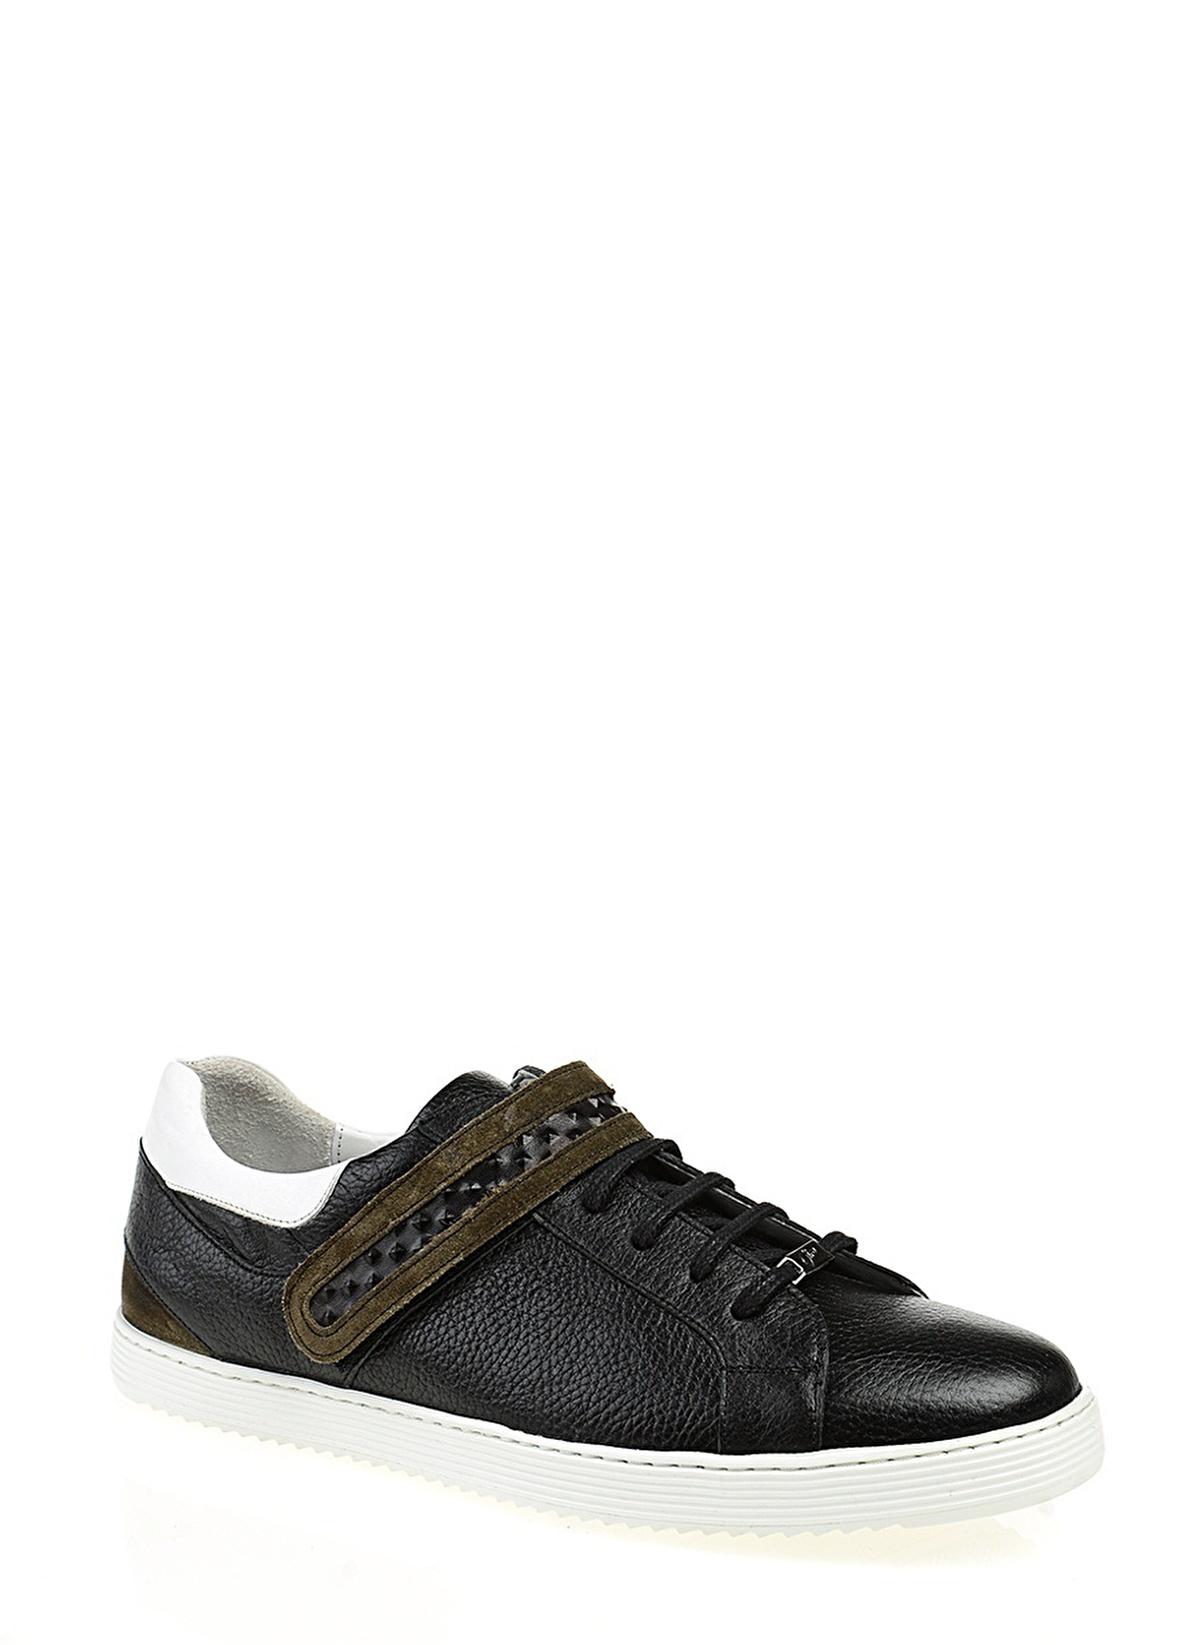 Divarese Lifestyle Ayakkabı 5017398 E Sneaker – 169.0 TL